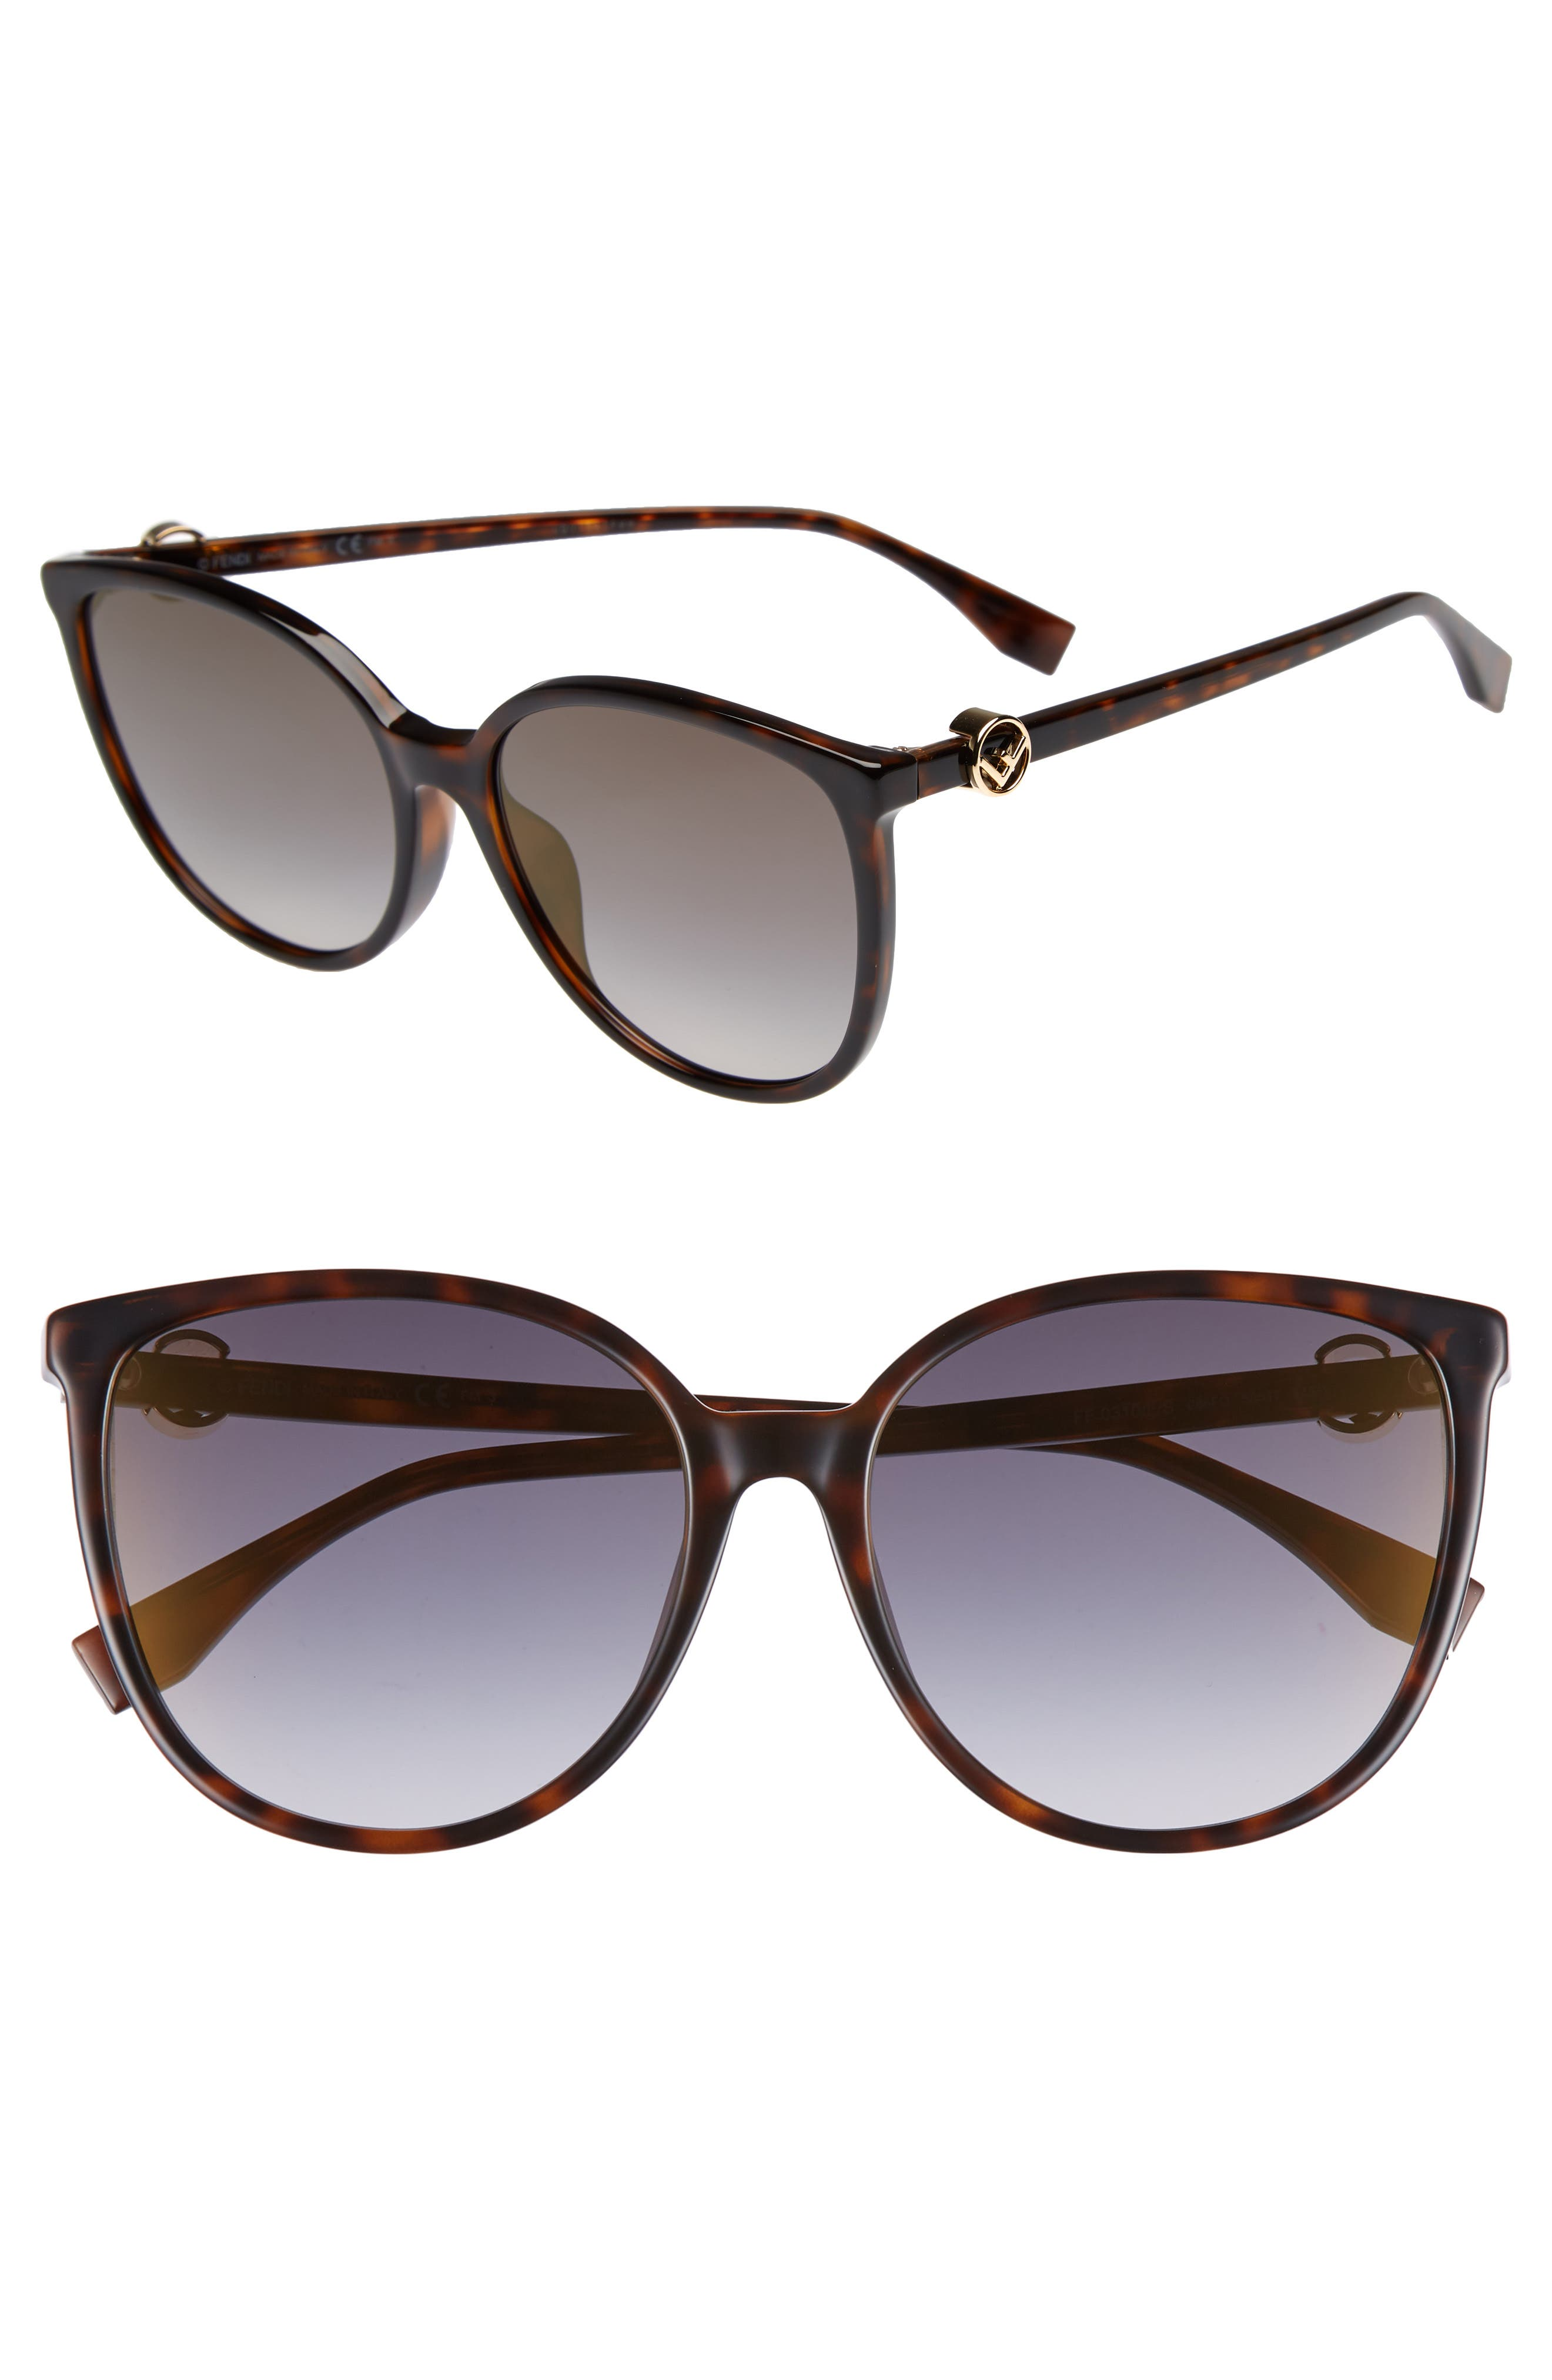 Alternate Image 1 Selected - Fendi 58mm Retro Special Fit Sunglasses